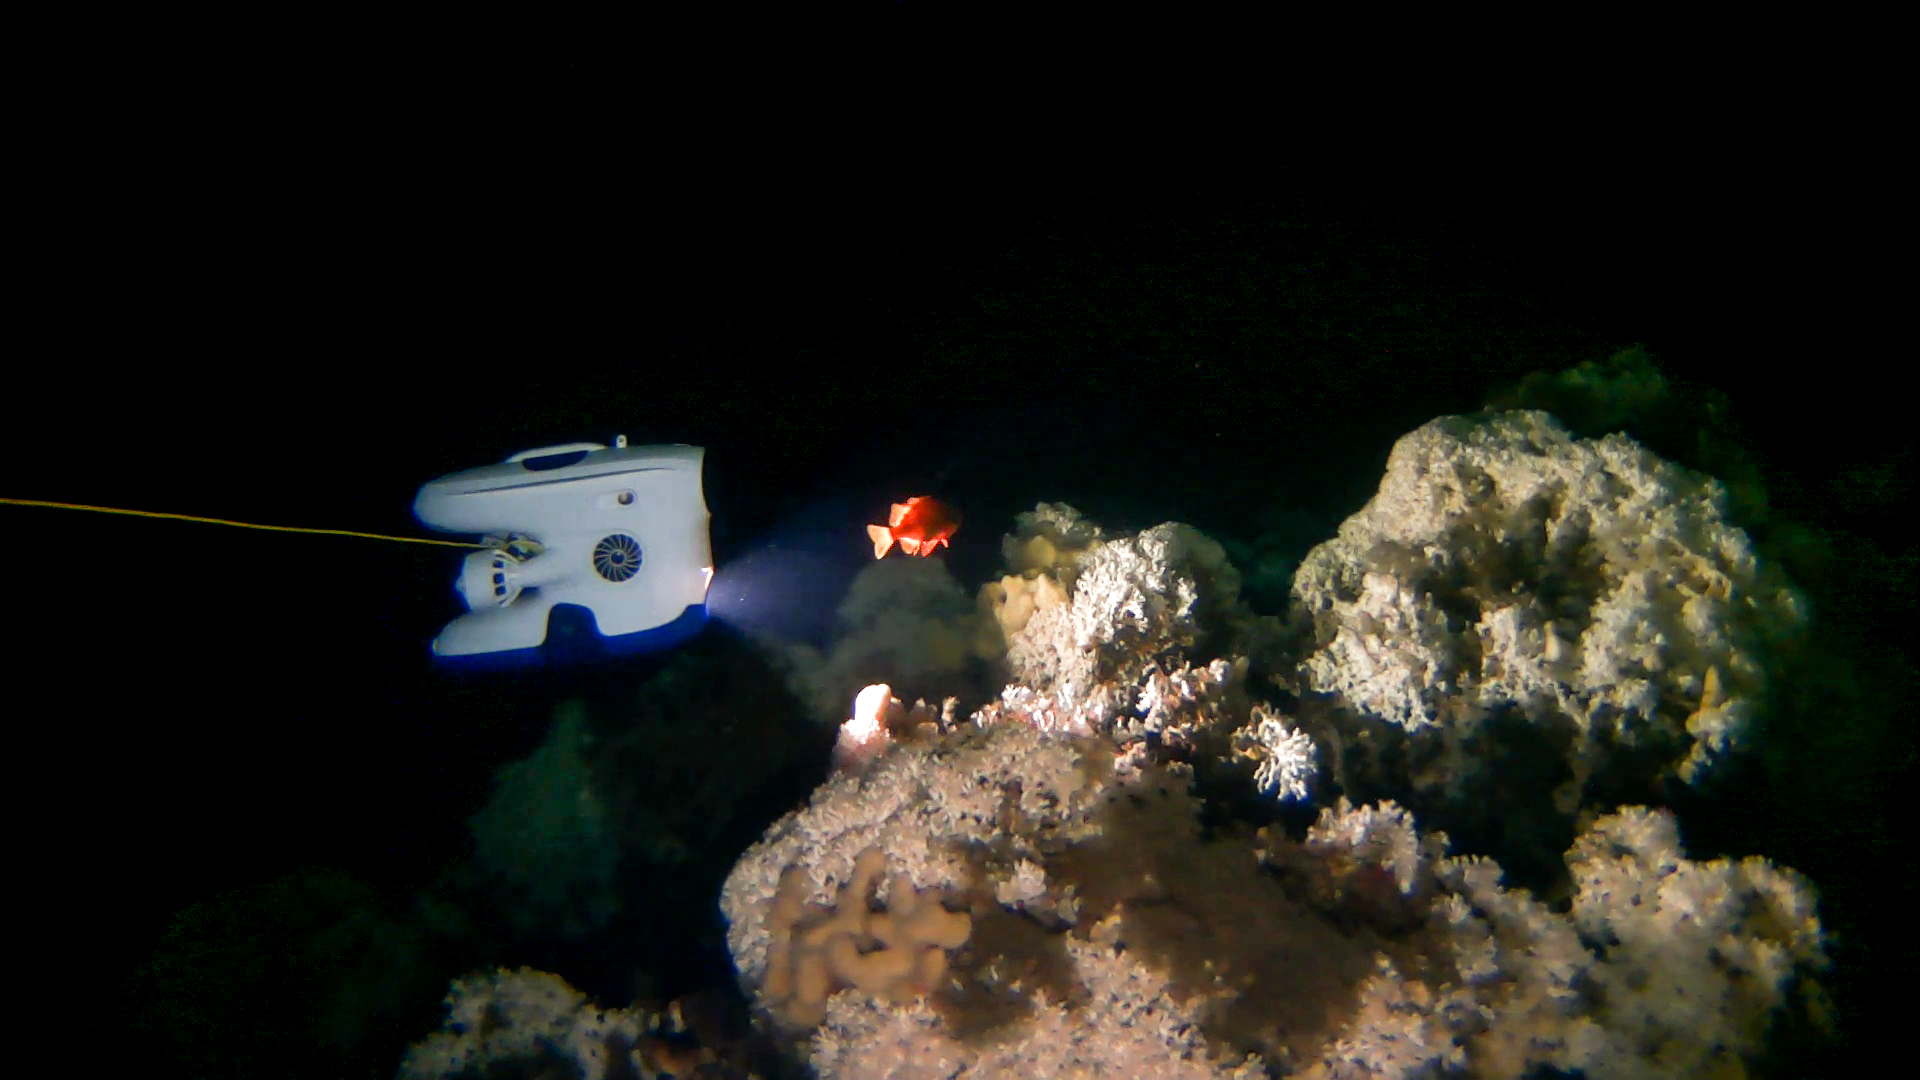 Blueye Pioneer undervannsdronen filmer en lususer (Sebastes viviparus).